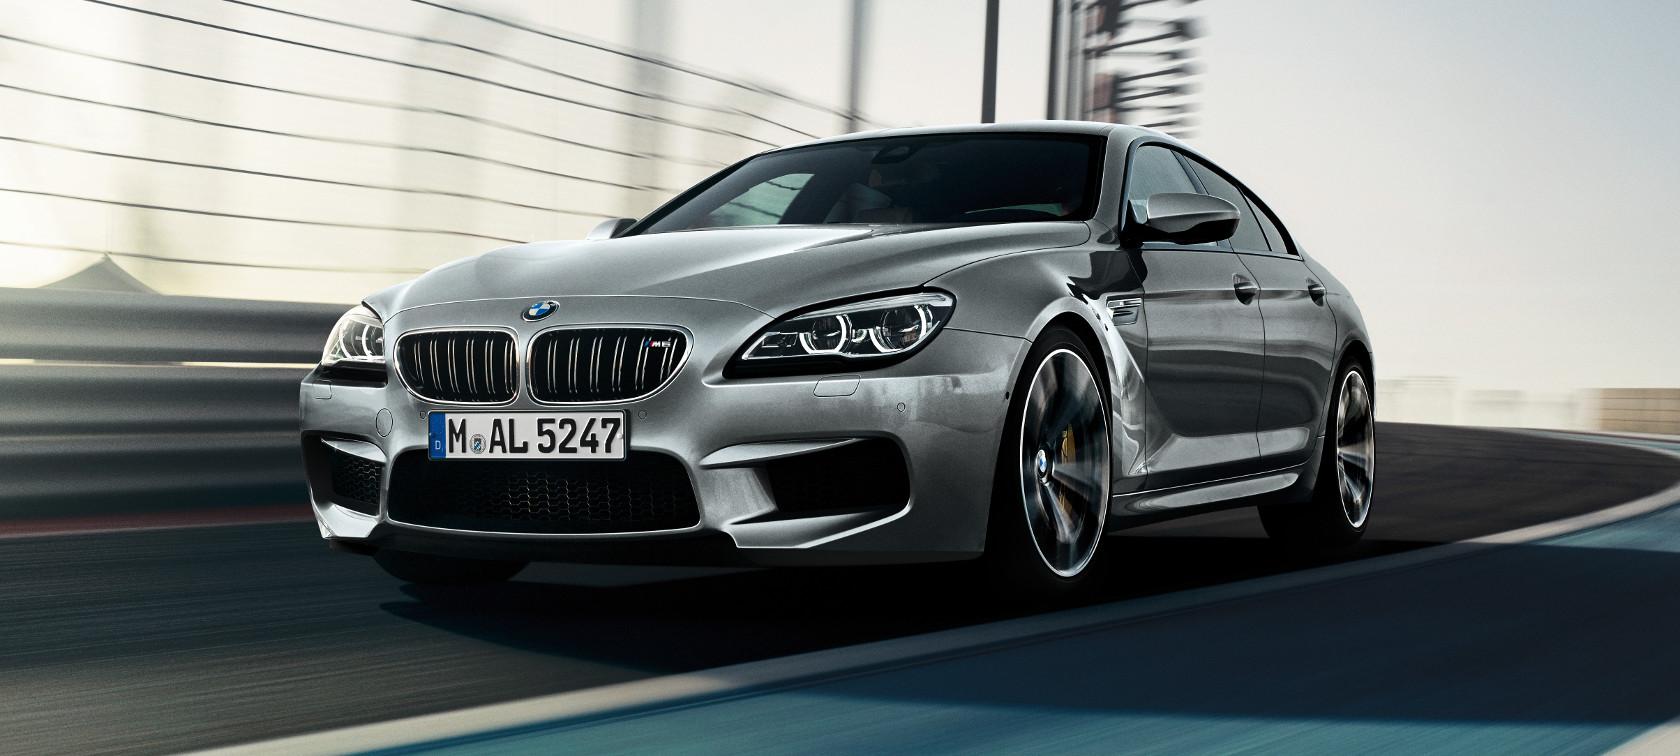 BMW M6 Gran Coupé : At a Glance